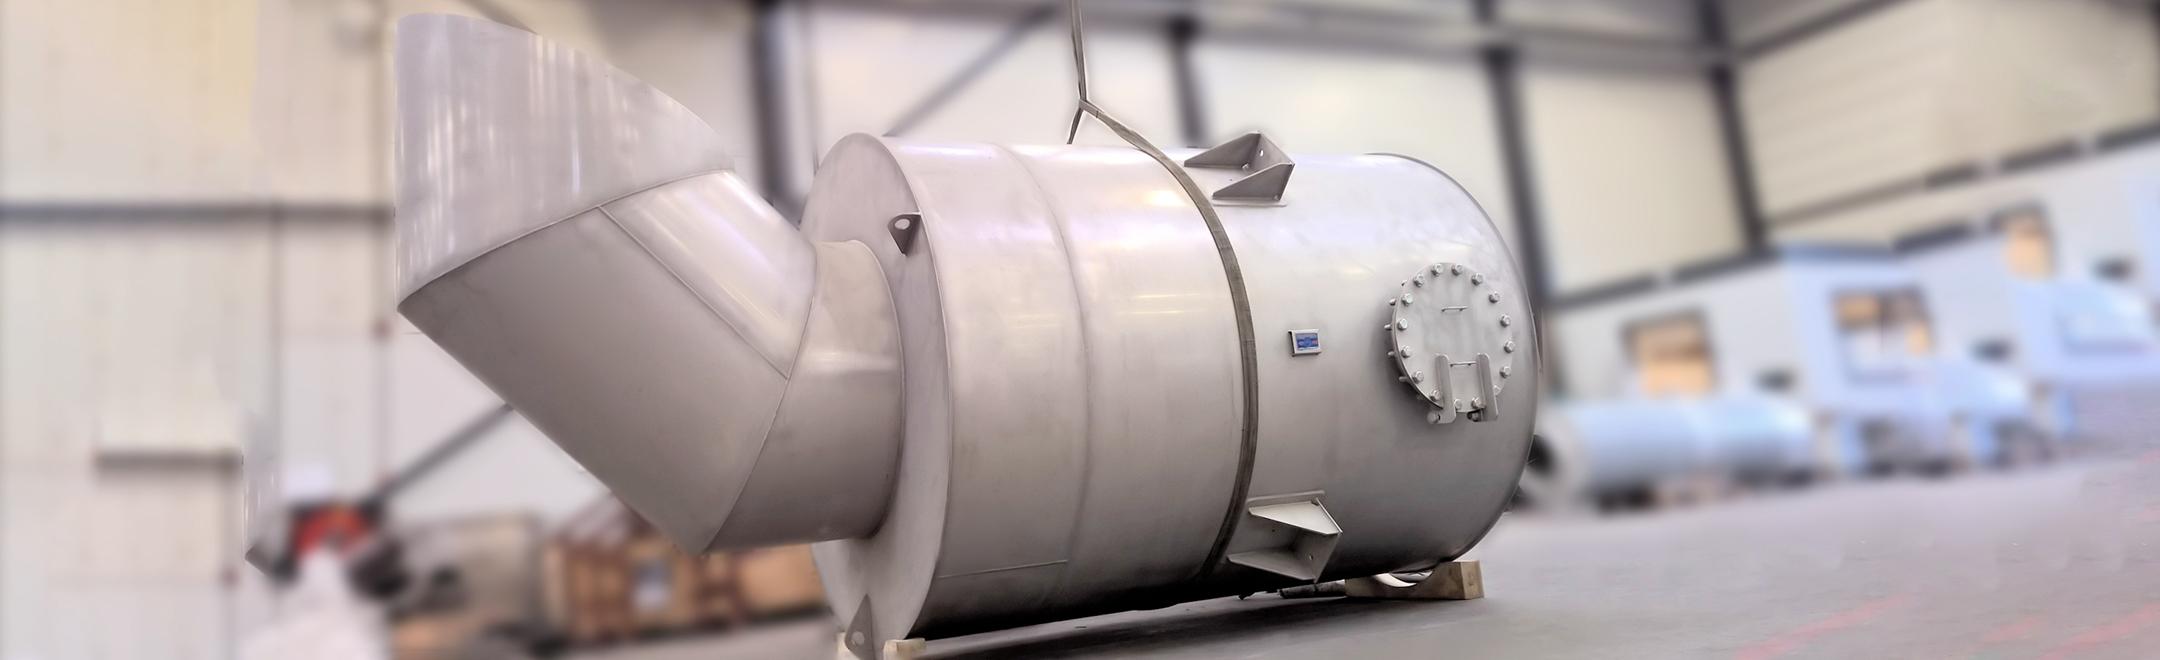 TIO BV Produkten - Cycloon filters